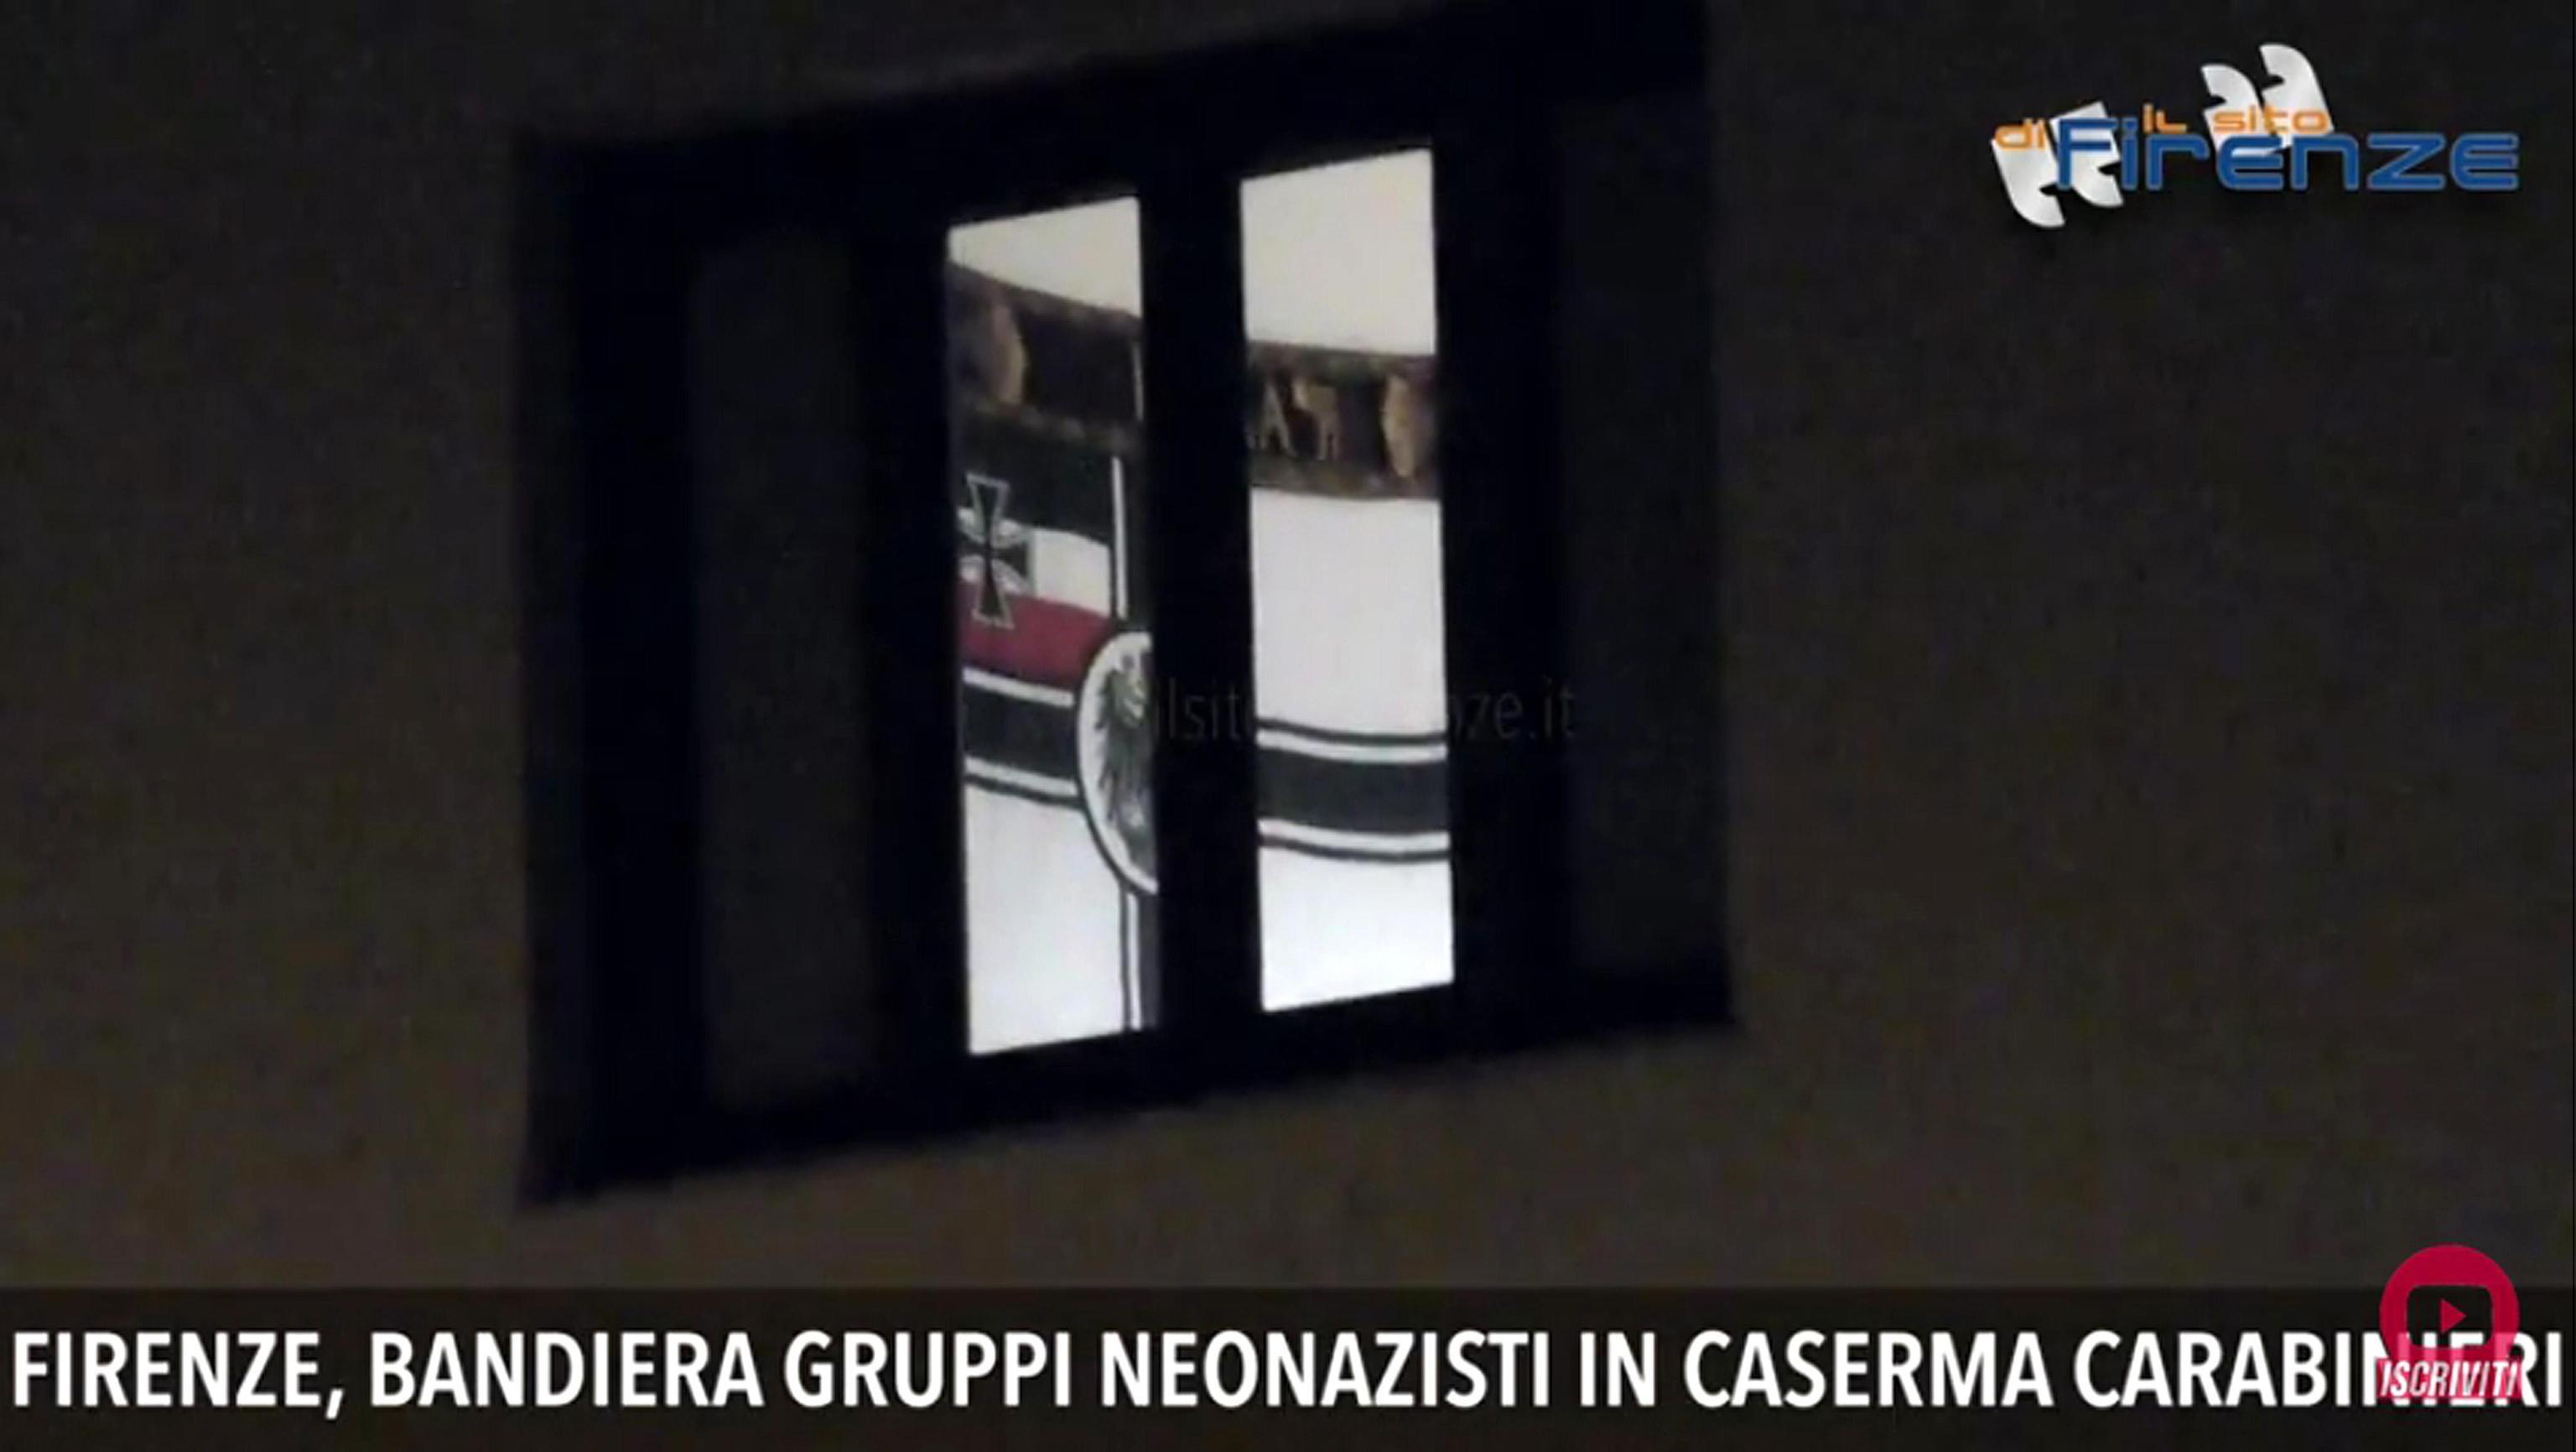 Bandiera neonazista in caserma, indagine